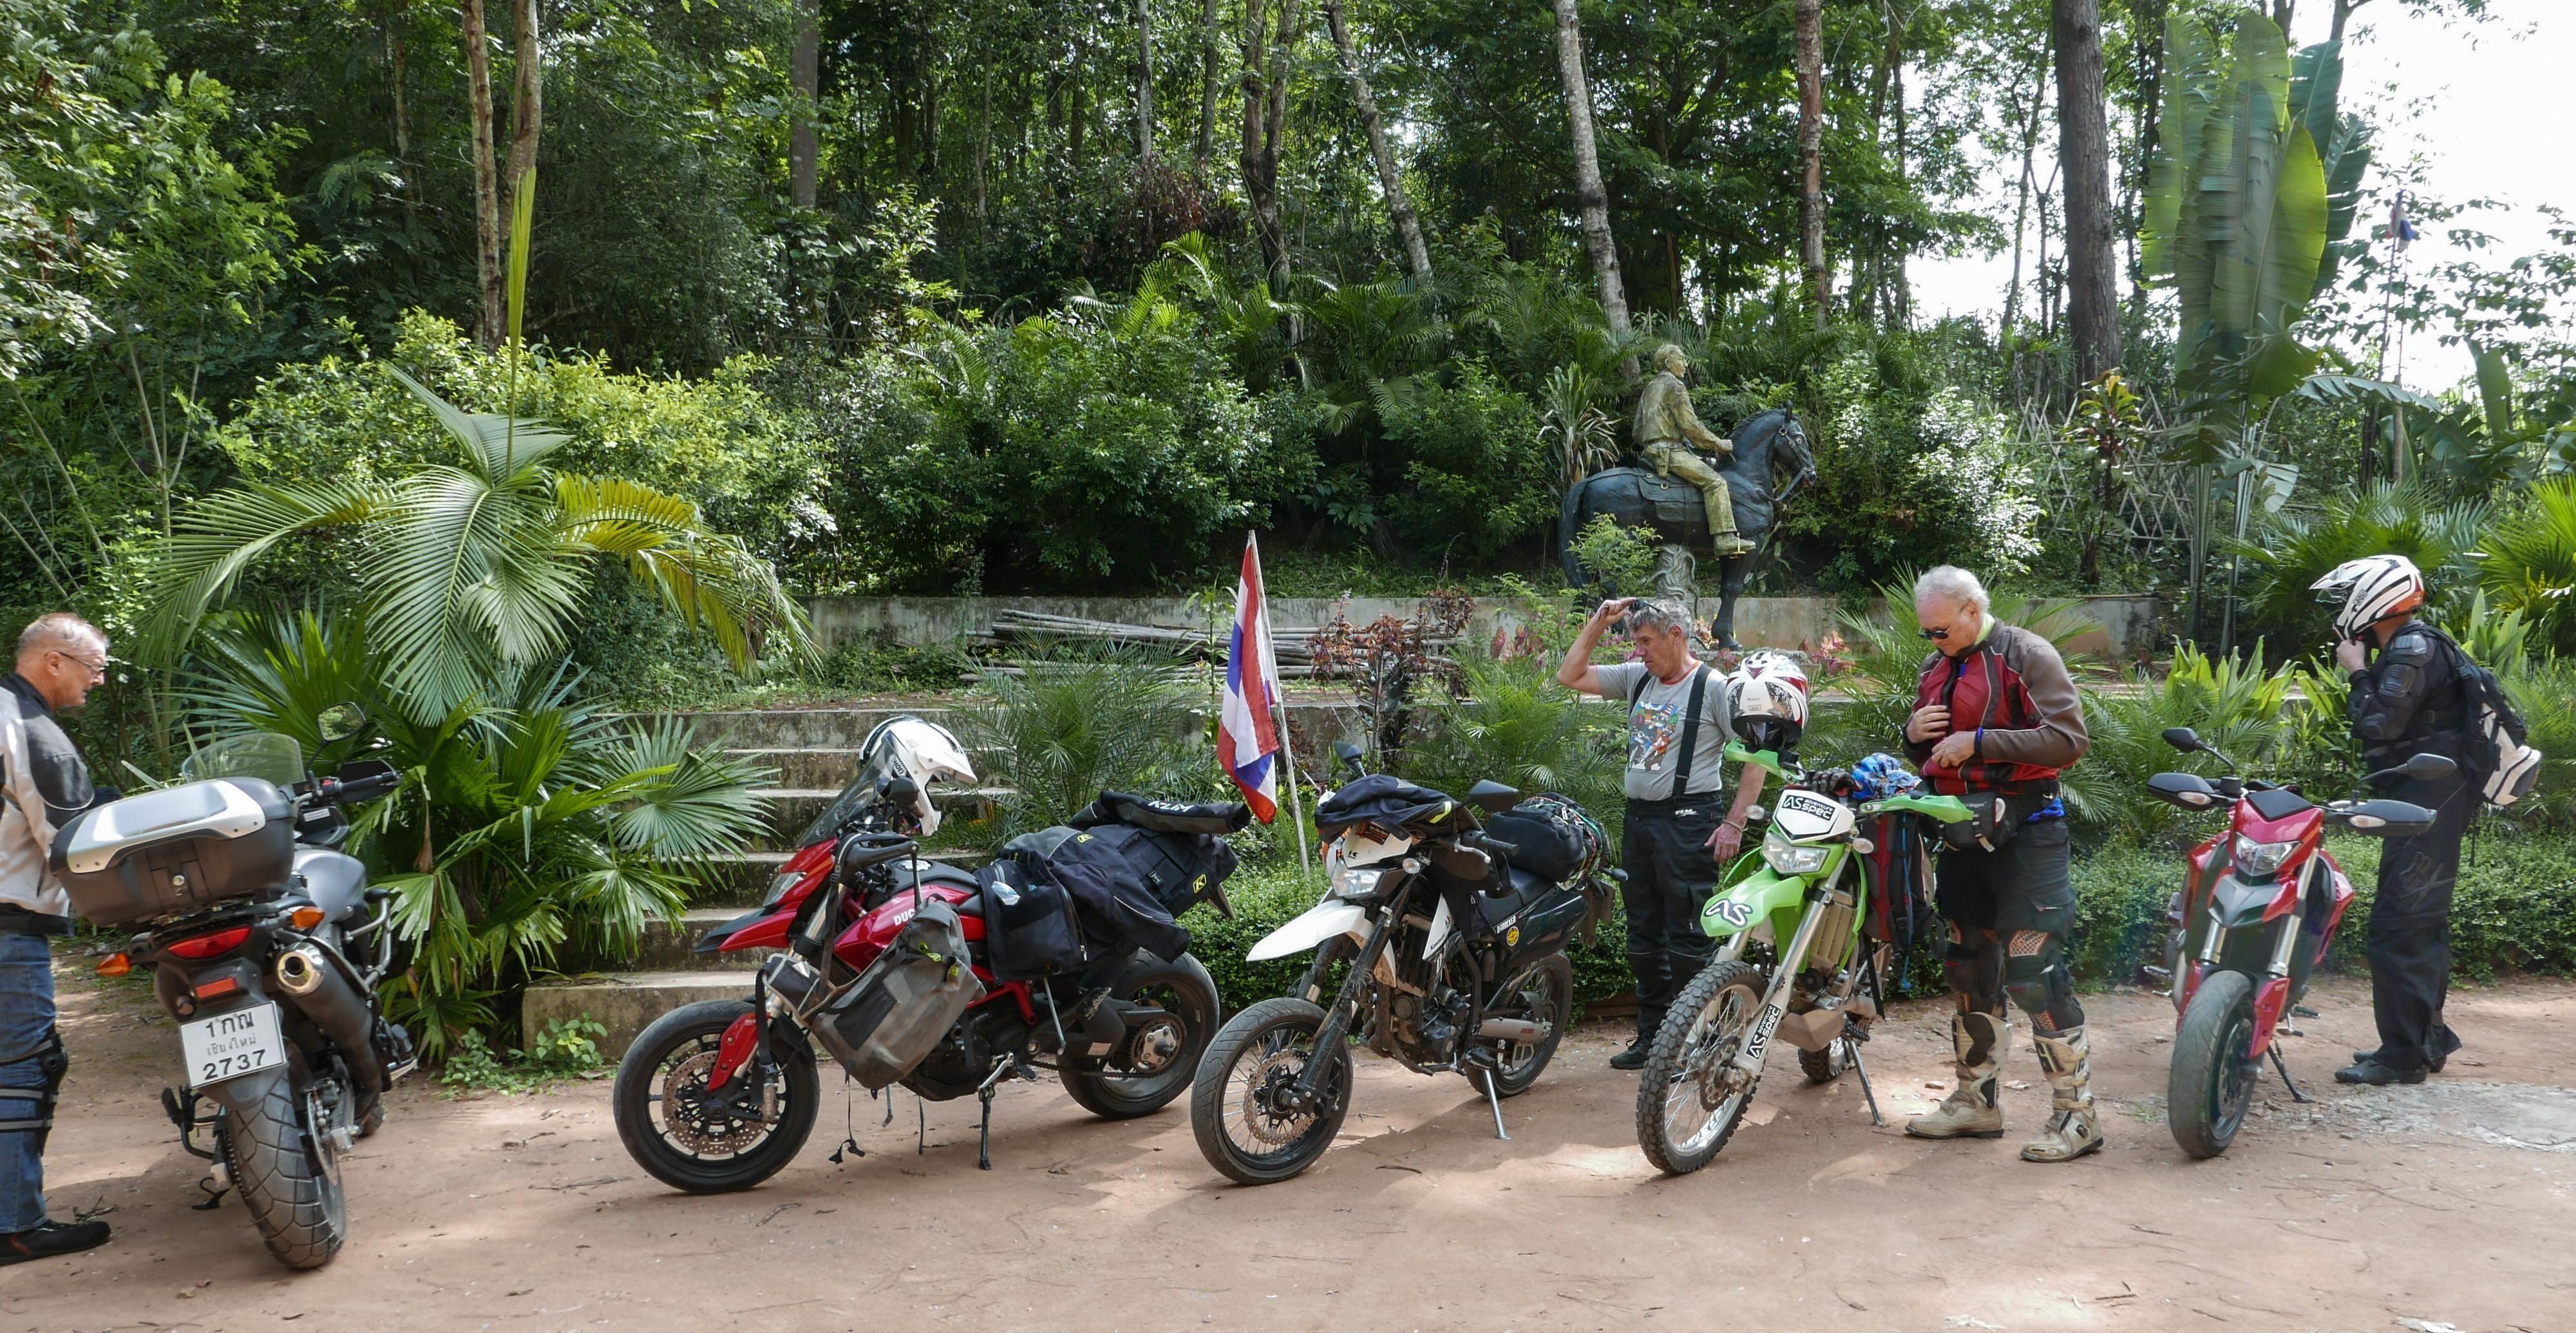 Thailand motorcycle tours with Motoasia. Travel Thailand with our motorcycle adventure tours.